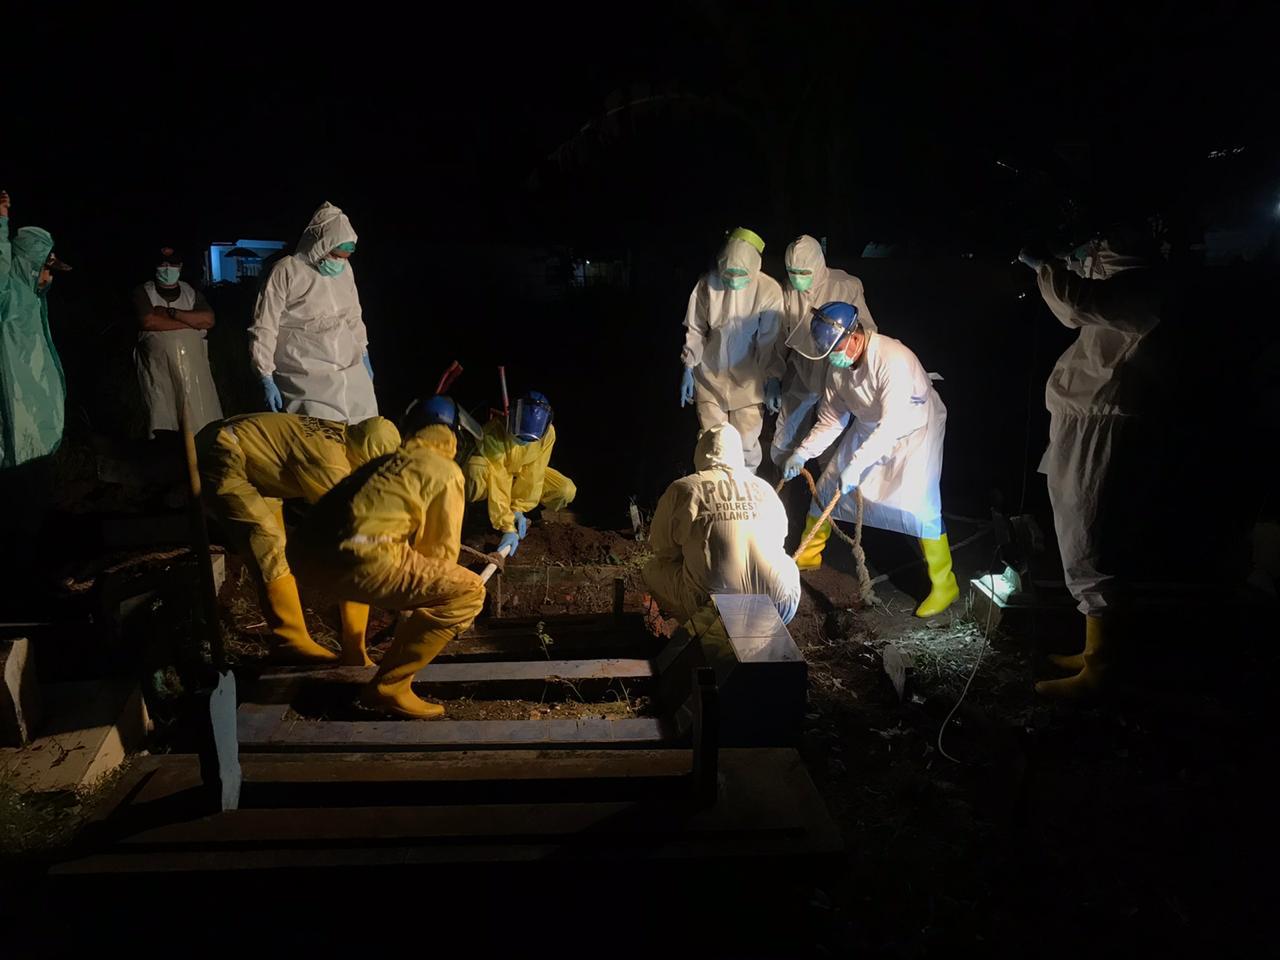 https: img.okezone.com content 2021 01 15 519 2344961 curhat-relawan-pemulasaran-jenazah-covid-19-pernah-dilempar-sampah-oleh-warga-C2sRY5dA1Q.jpg